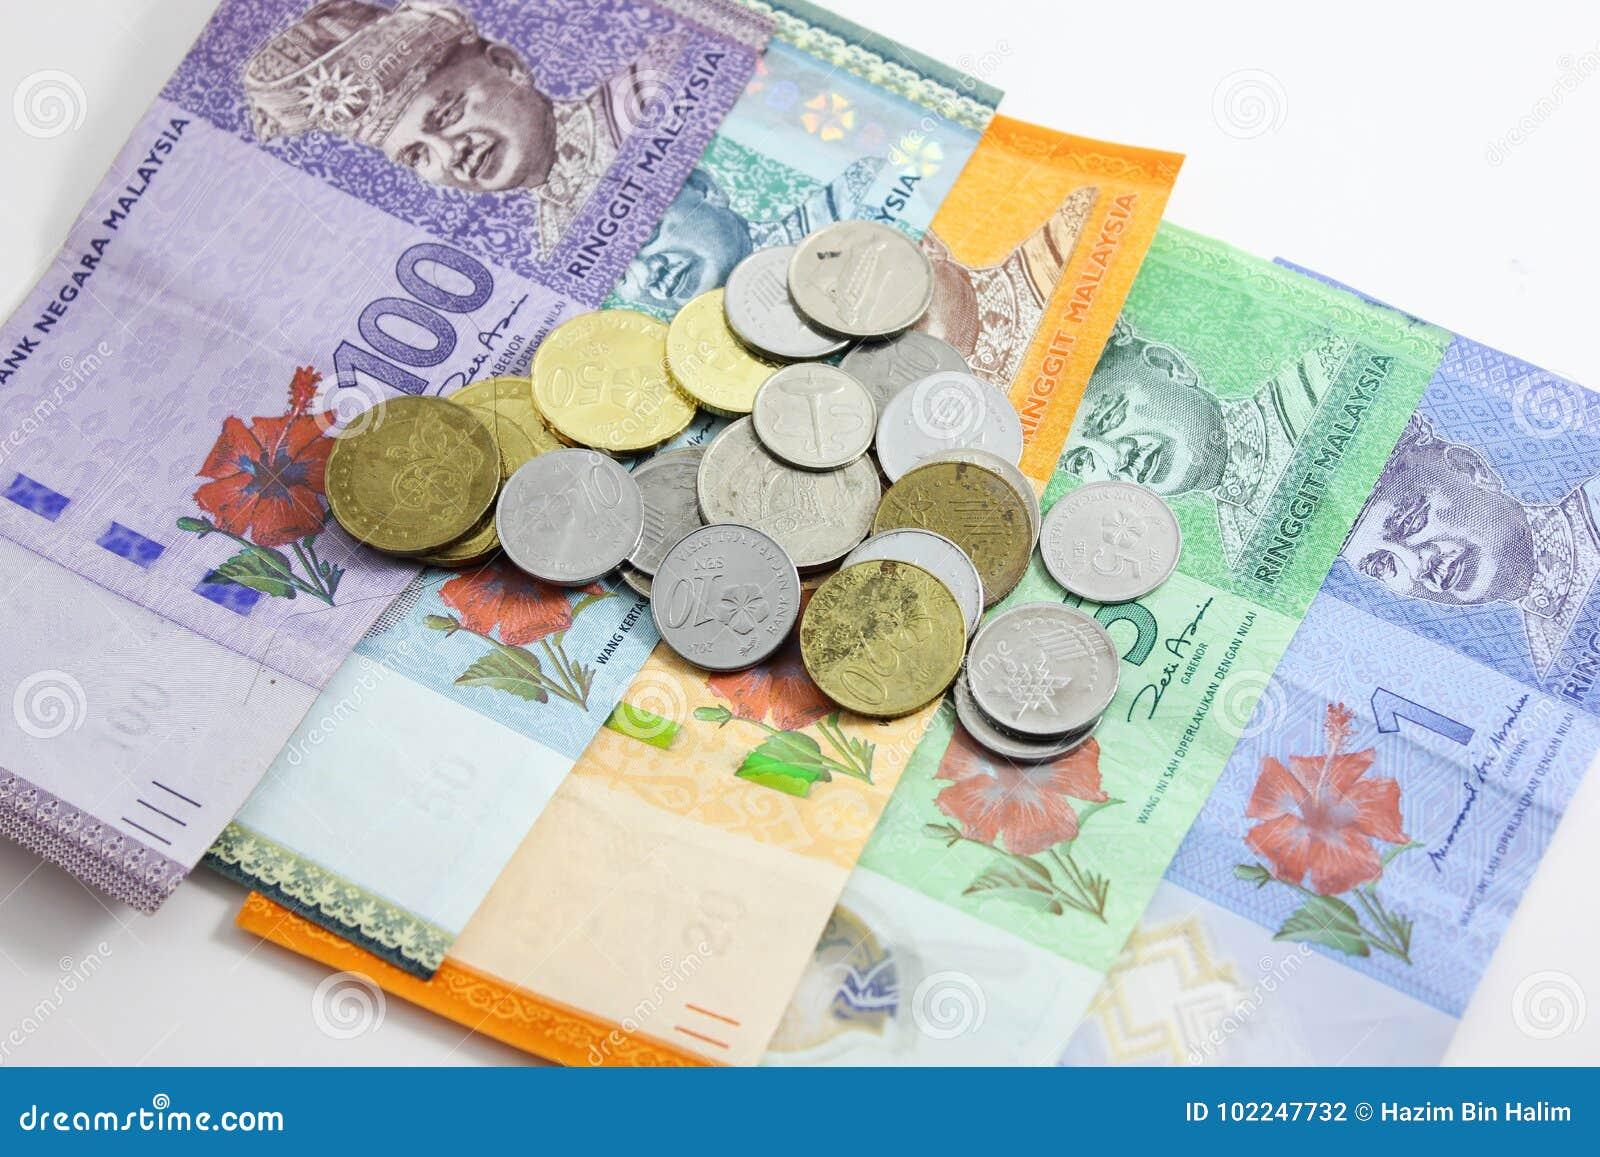 Closeup Shot Of Ringgit Malaysia Stock Photo - Image of note, bank